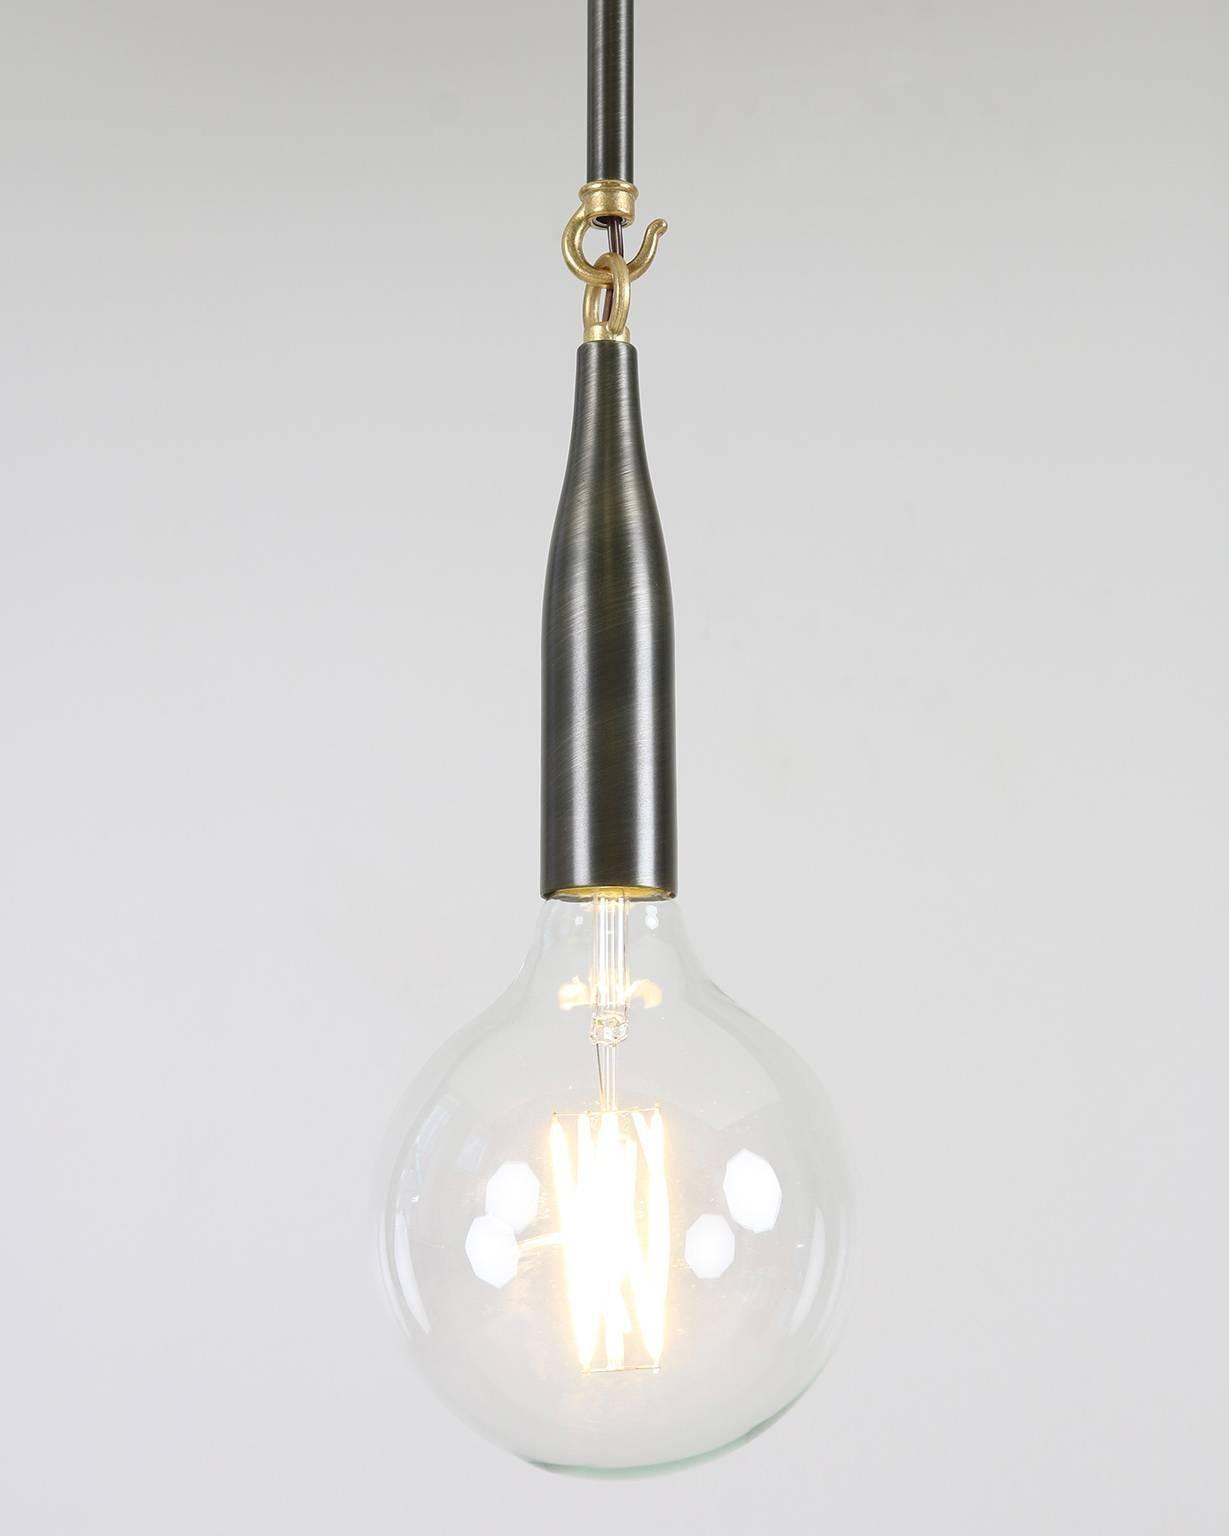 Xenon Art Lighting